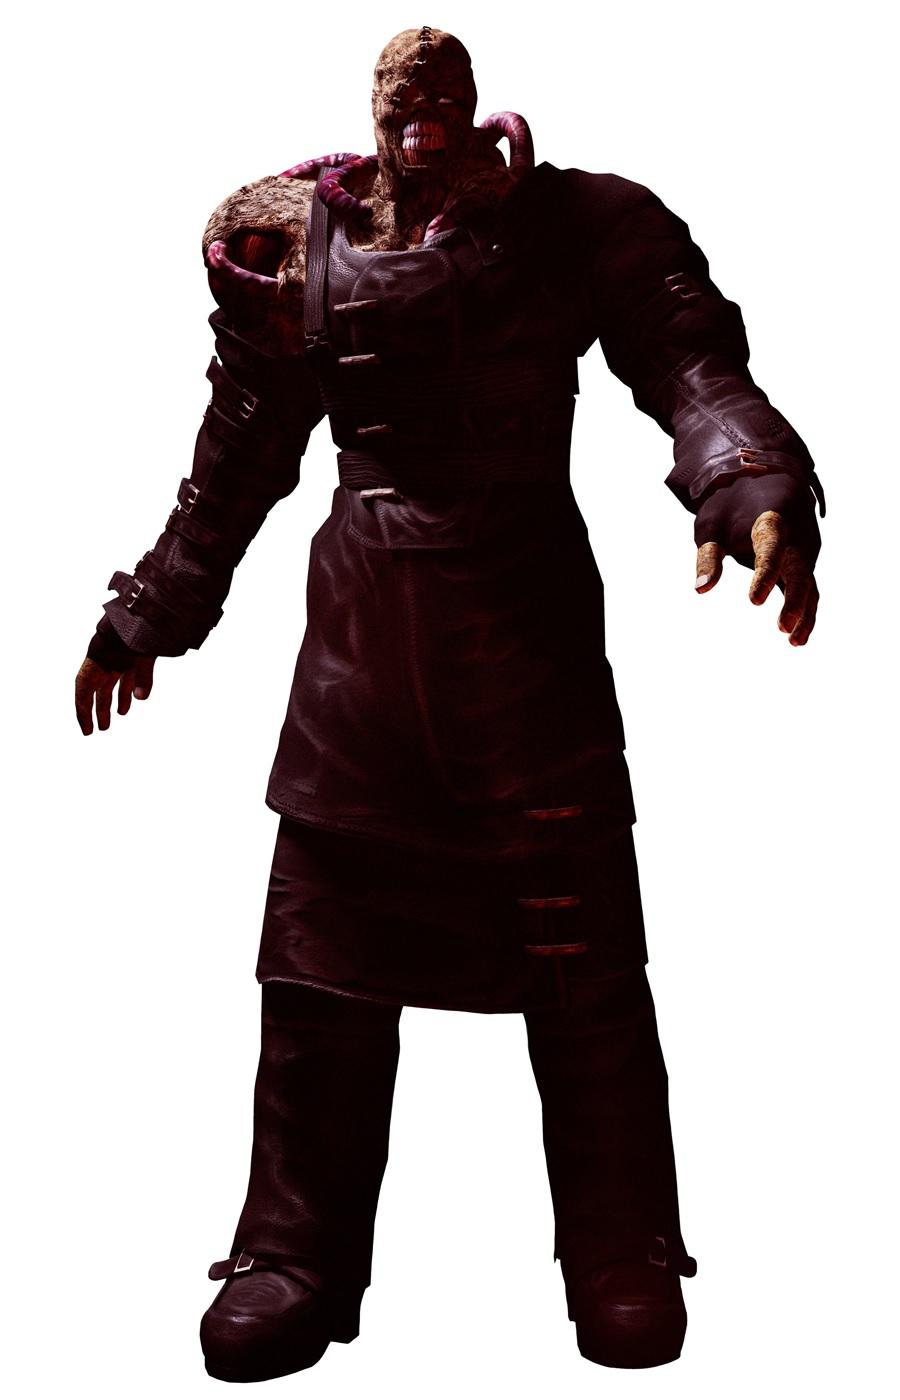 Nemesis (Resident Evil) | Villains Wiki | FANDOM powered ...